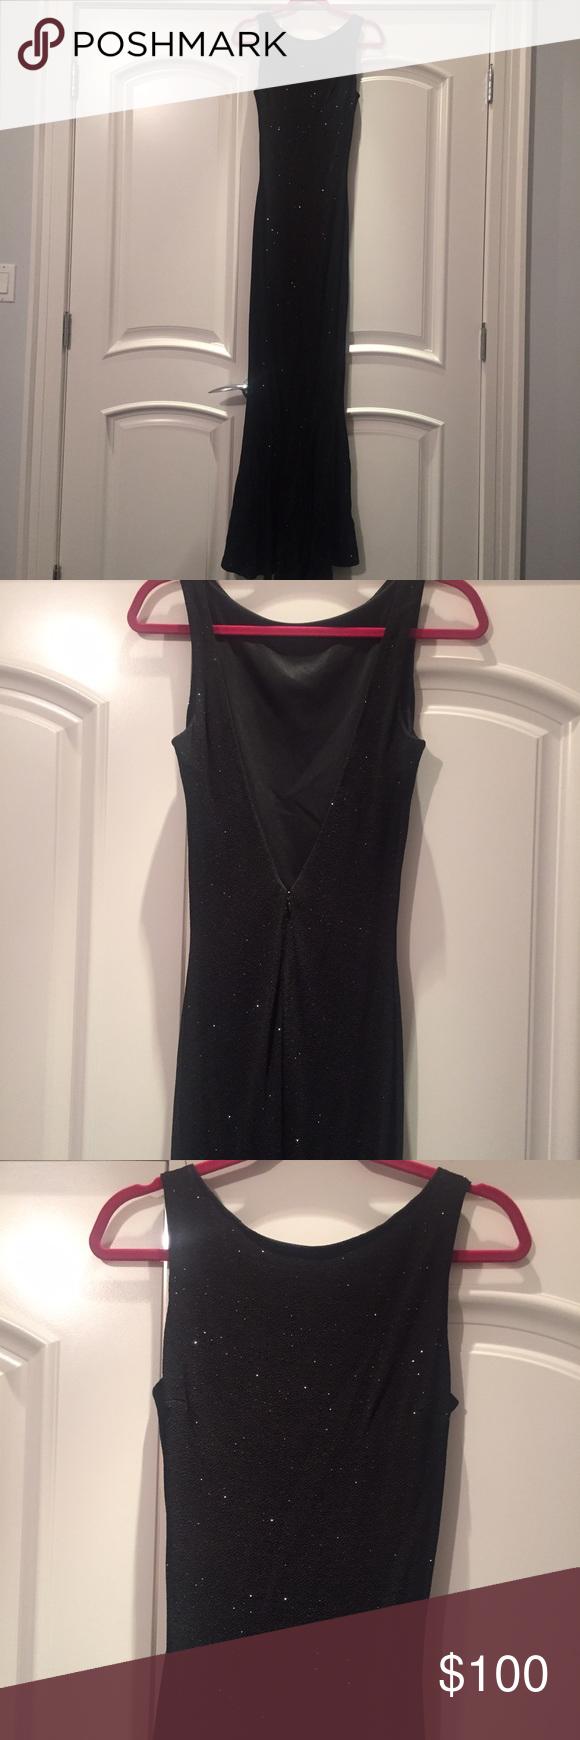 Long sequined black fishtail dress V-neck at back. Worn twice. Size 6 Jessica McClintock Dresses Wedding